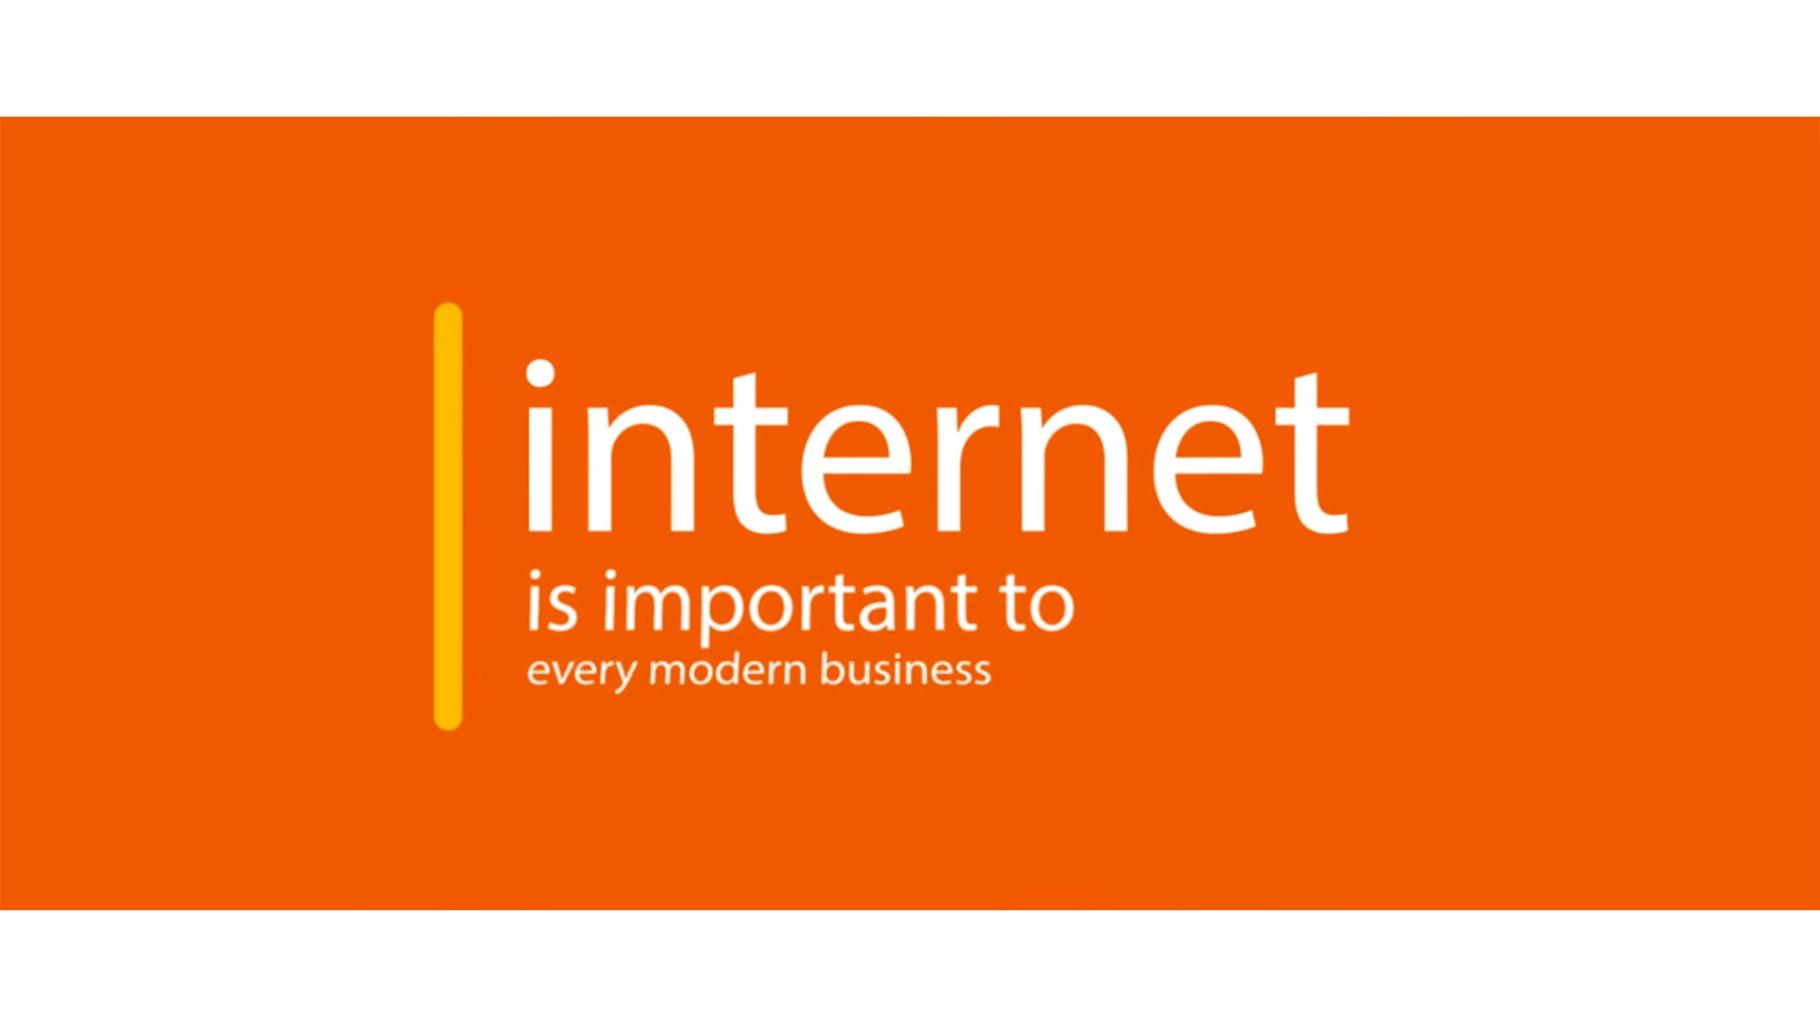 big business internet teledata ict